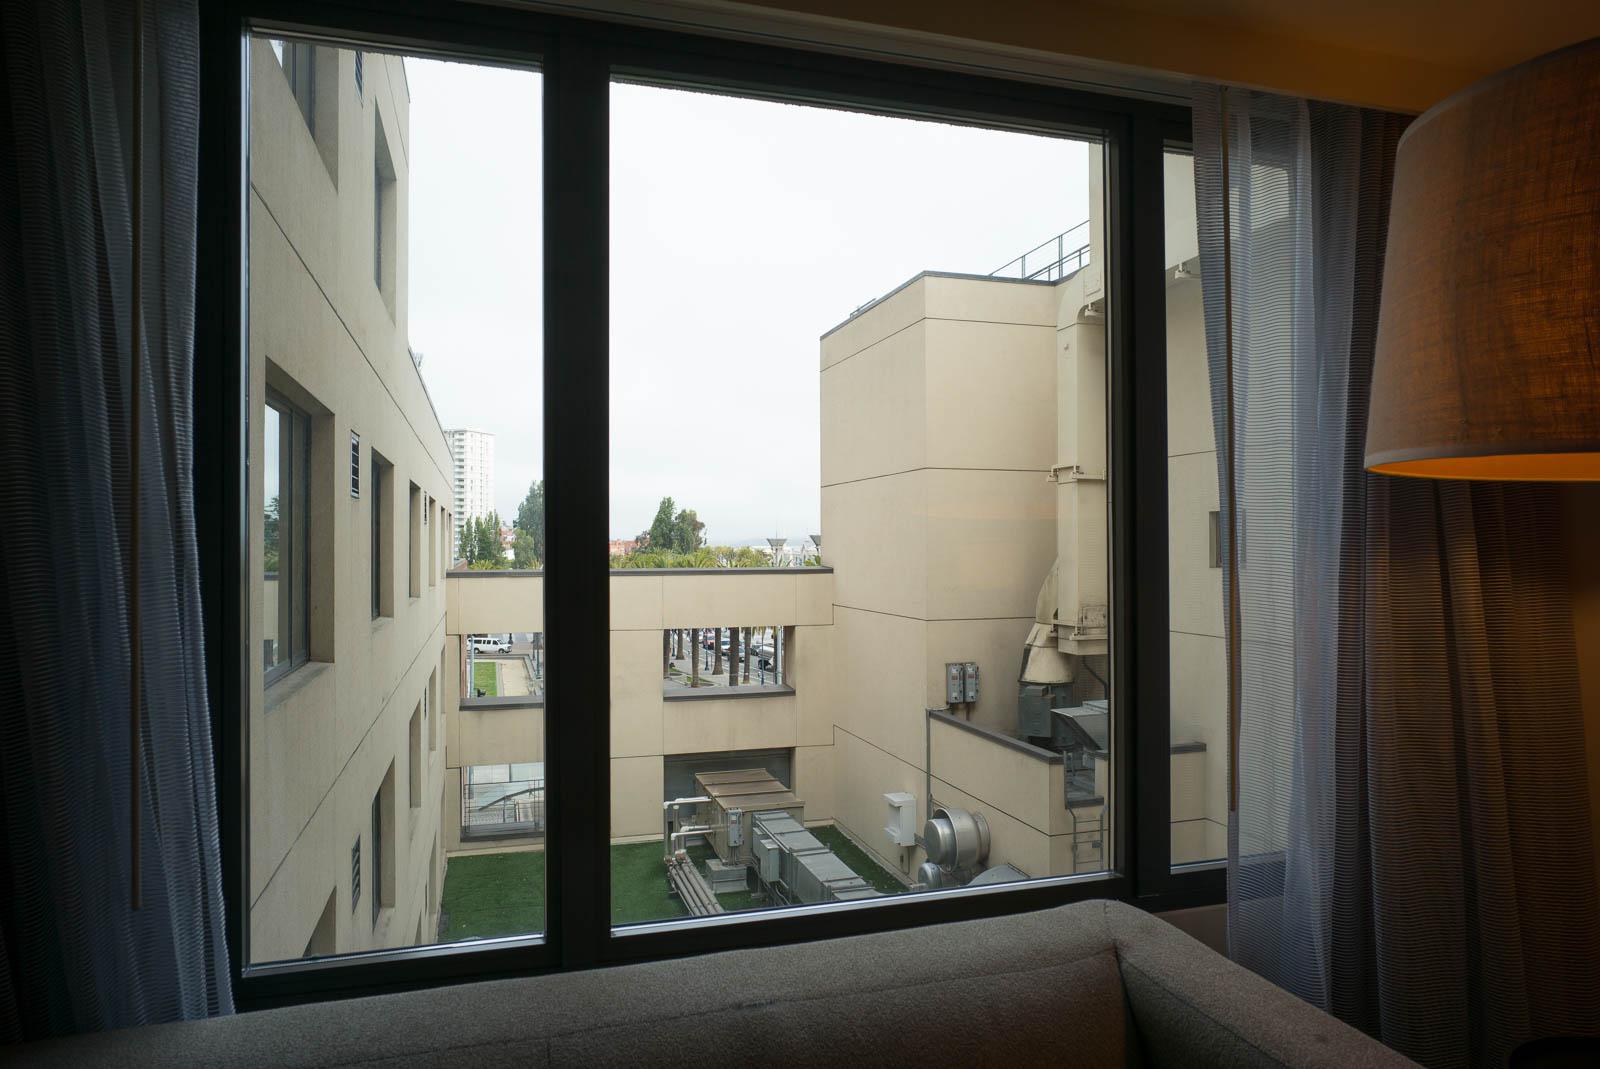 Room 523, Hotel Vitale, San Francisco